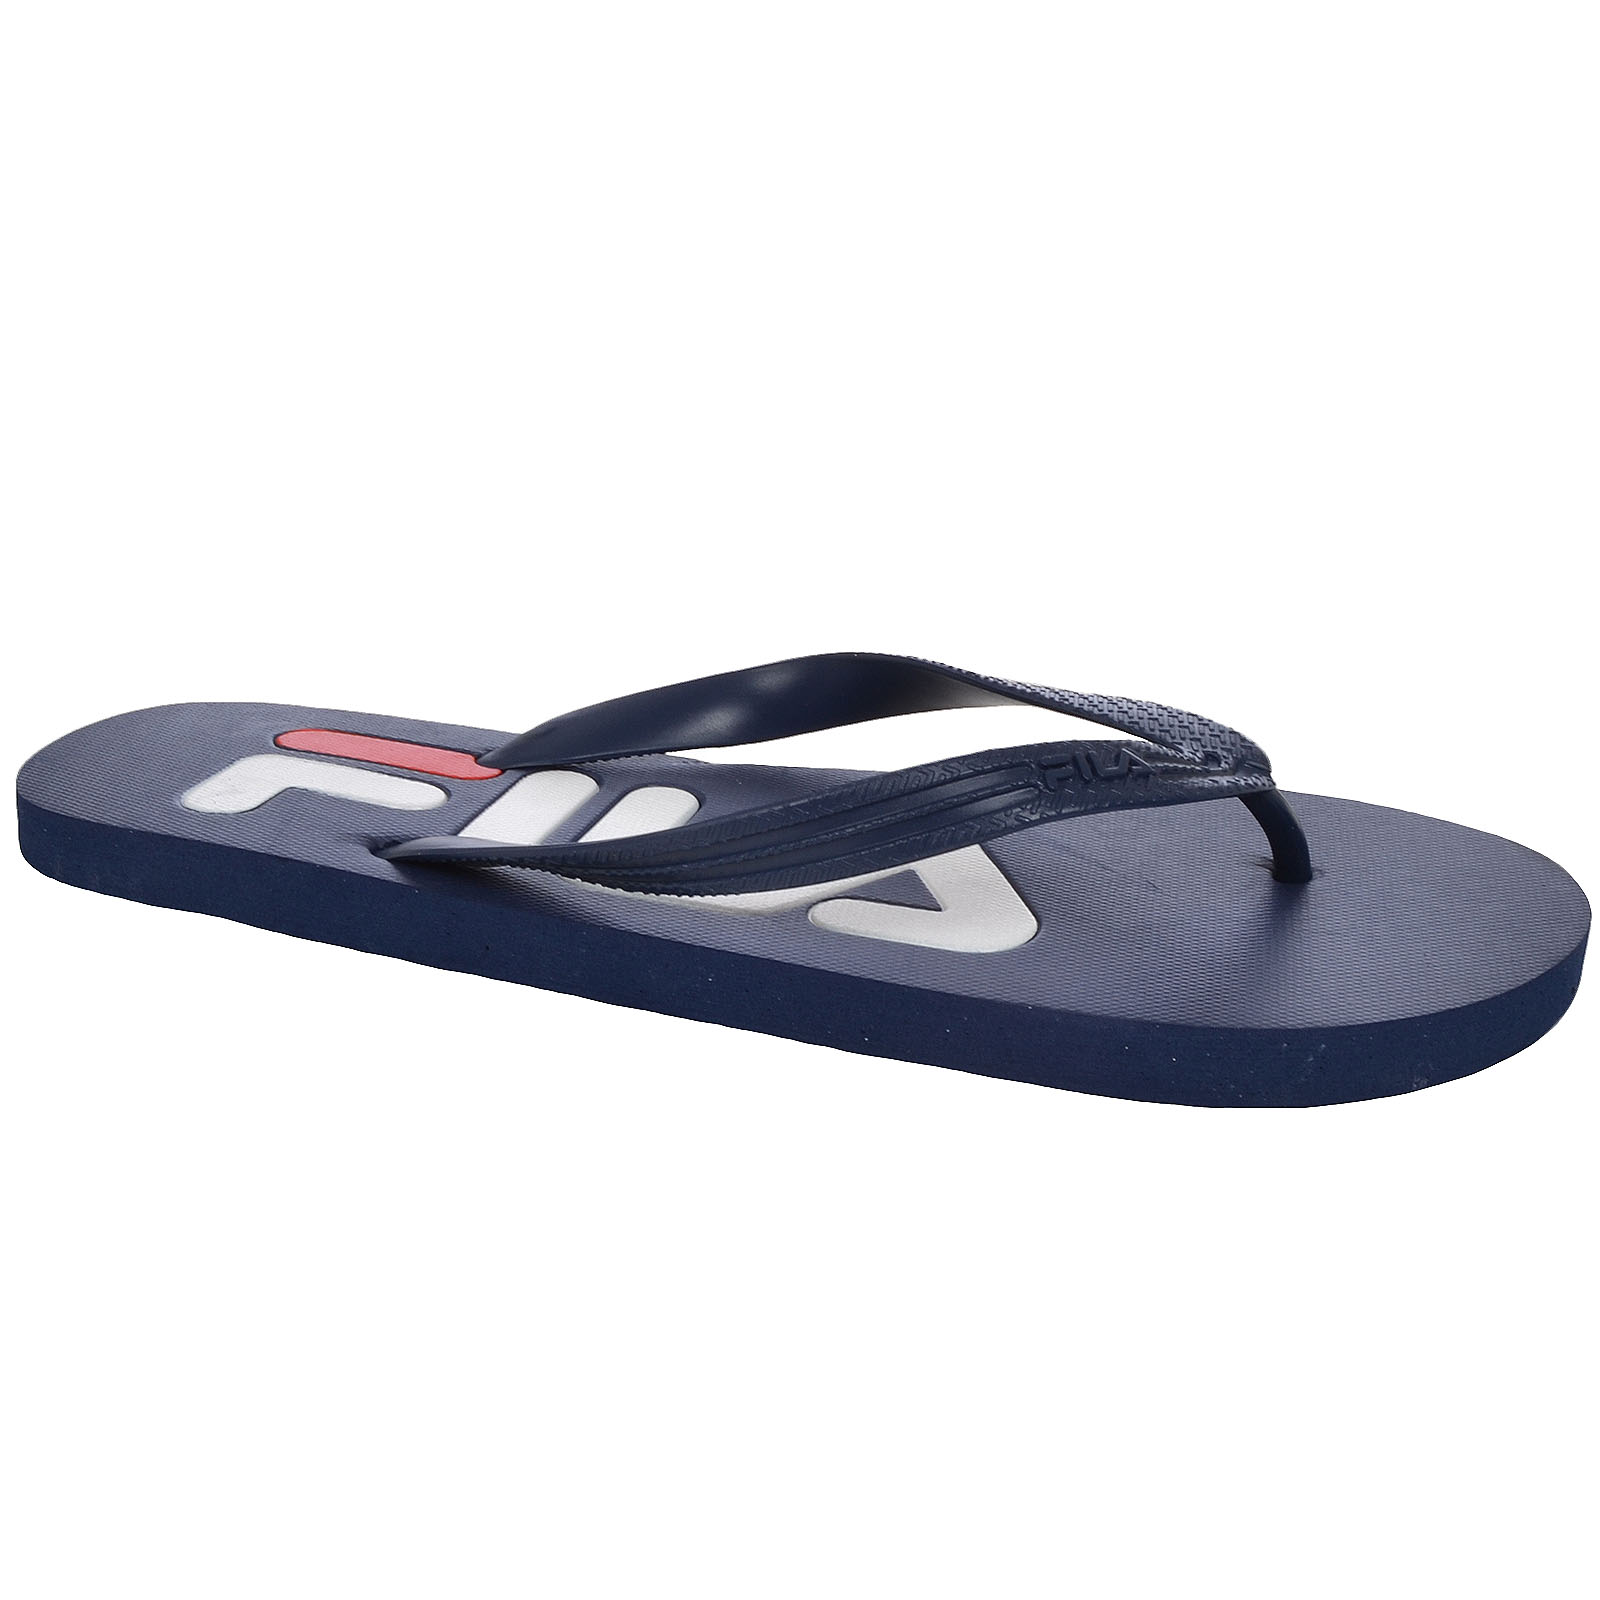 f1a8df1a8d4 Fila Mens Troy Flip Flops Beach Pool Holiday Slip On Sandals Thongs ...